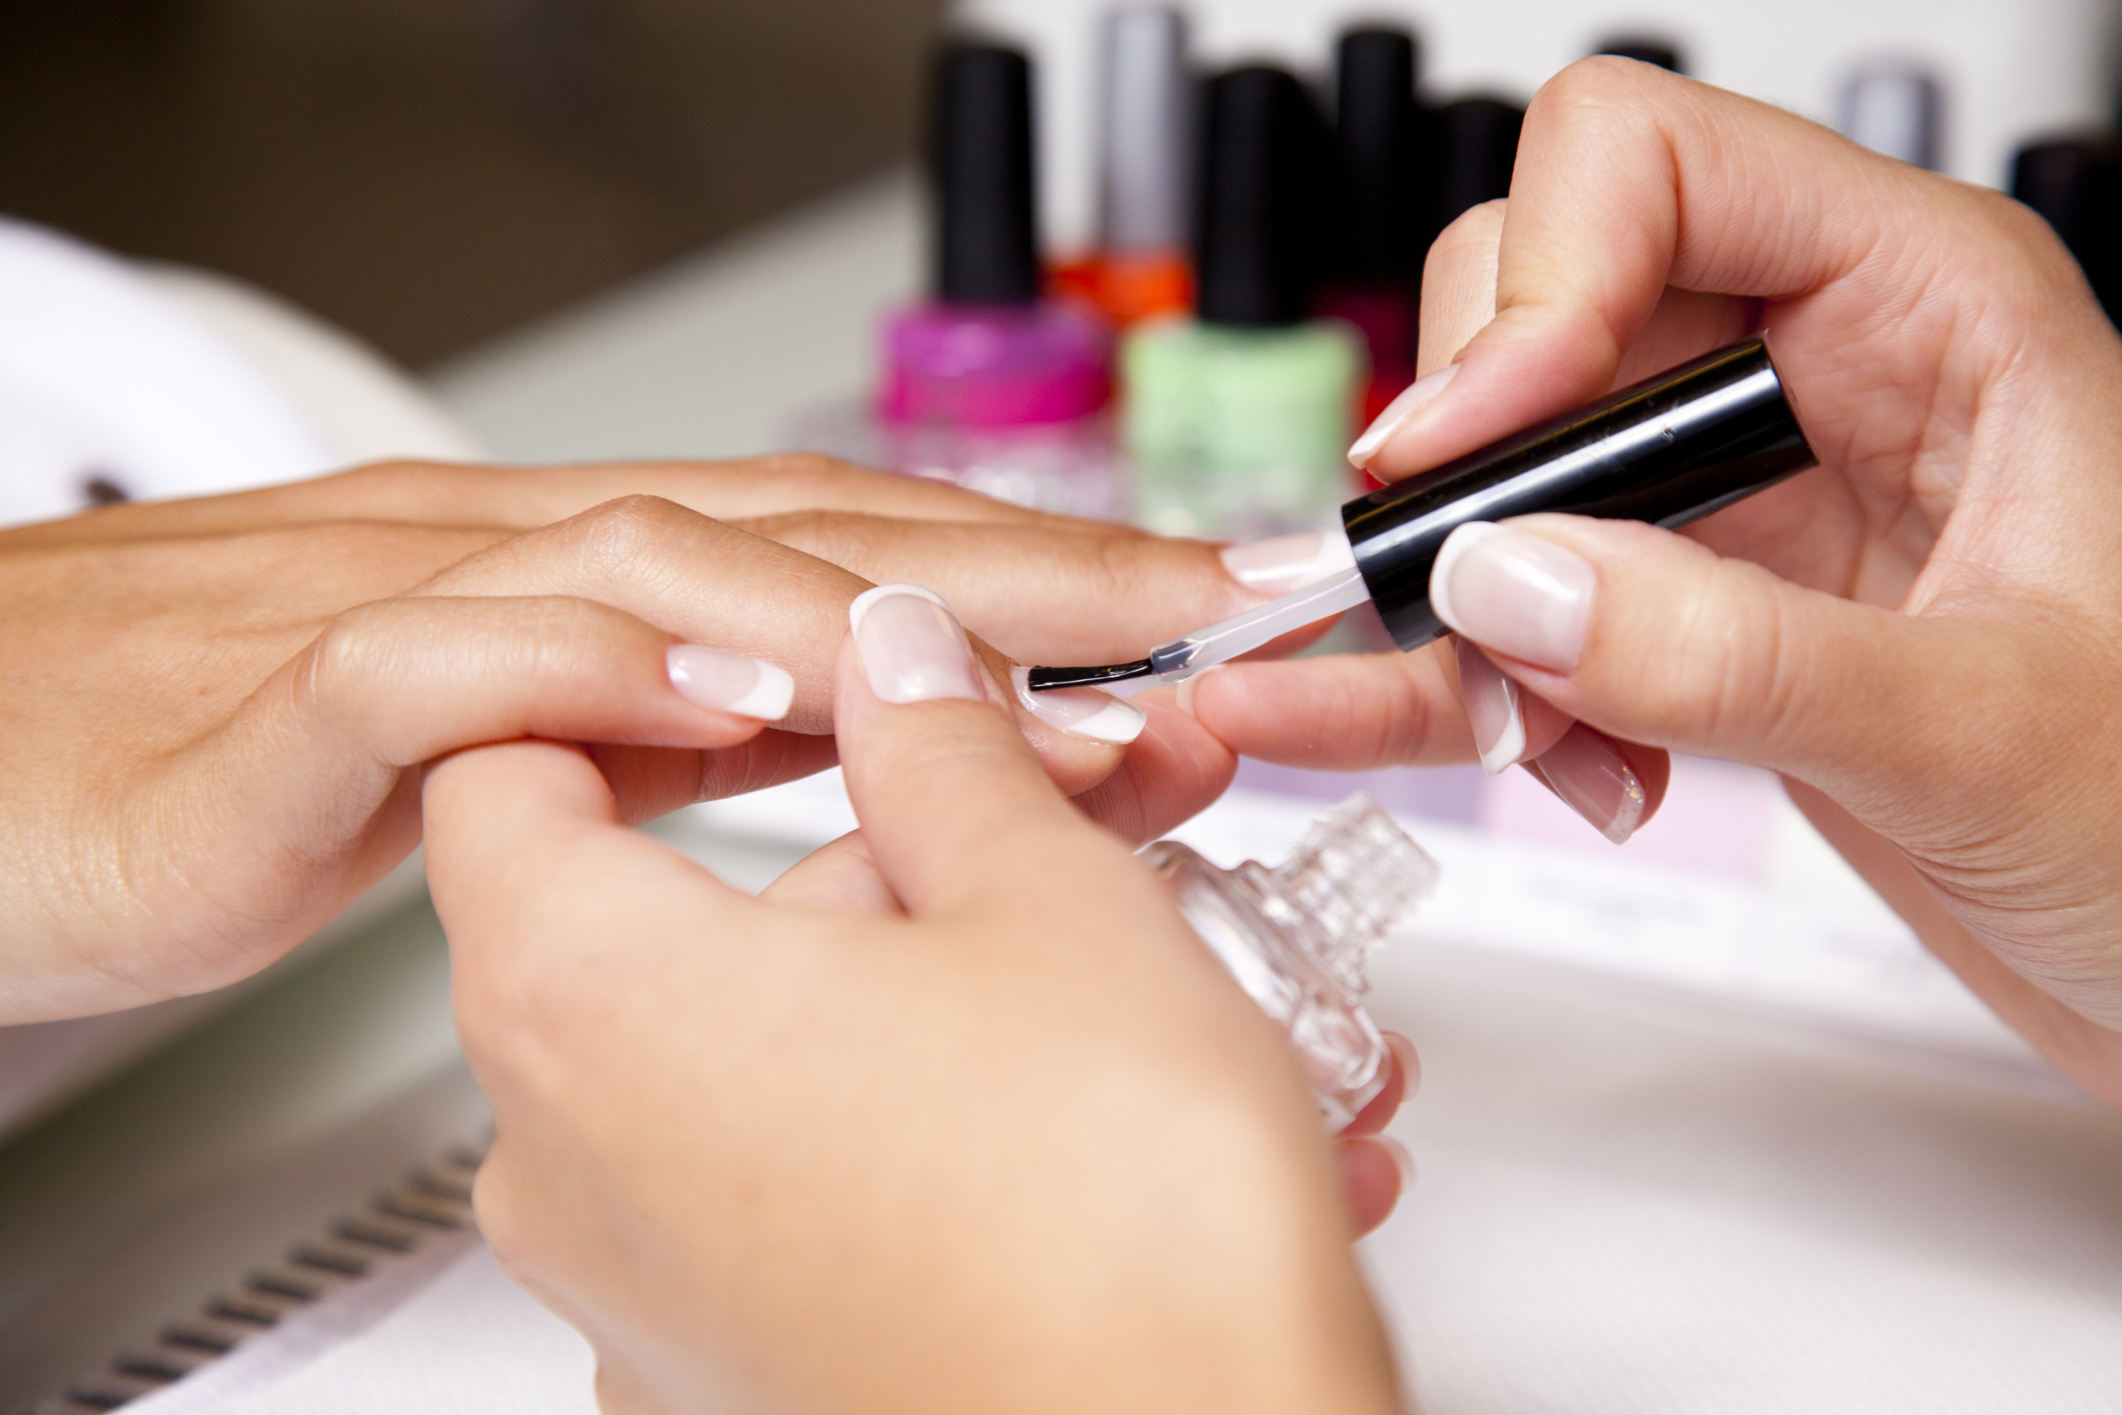 The Best Way to Strengthen Fingernails | LIVESTRONG.COM